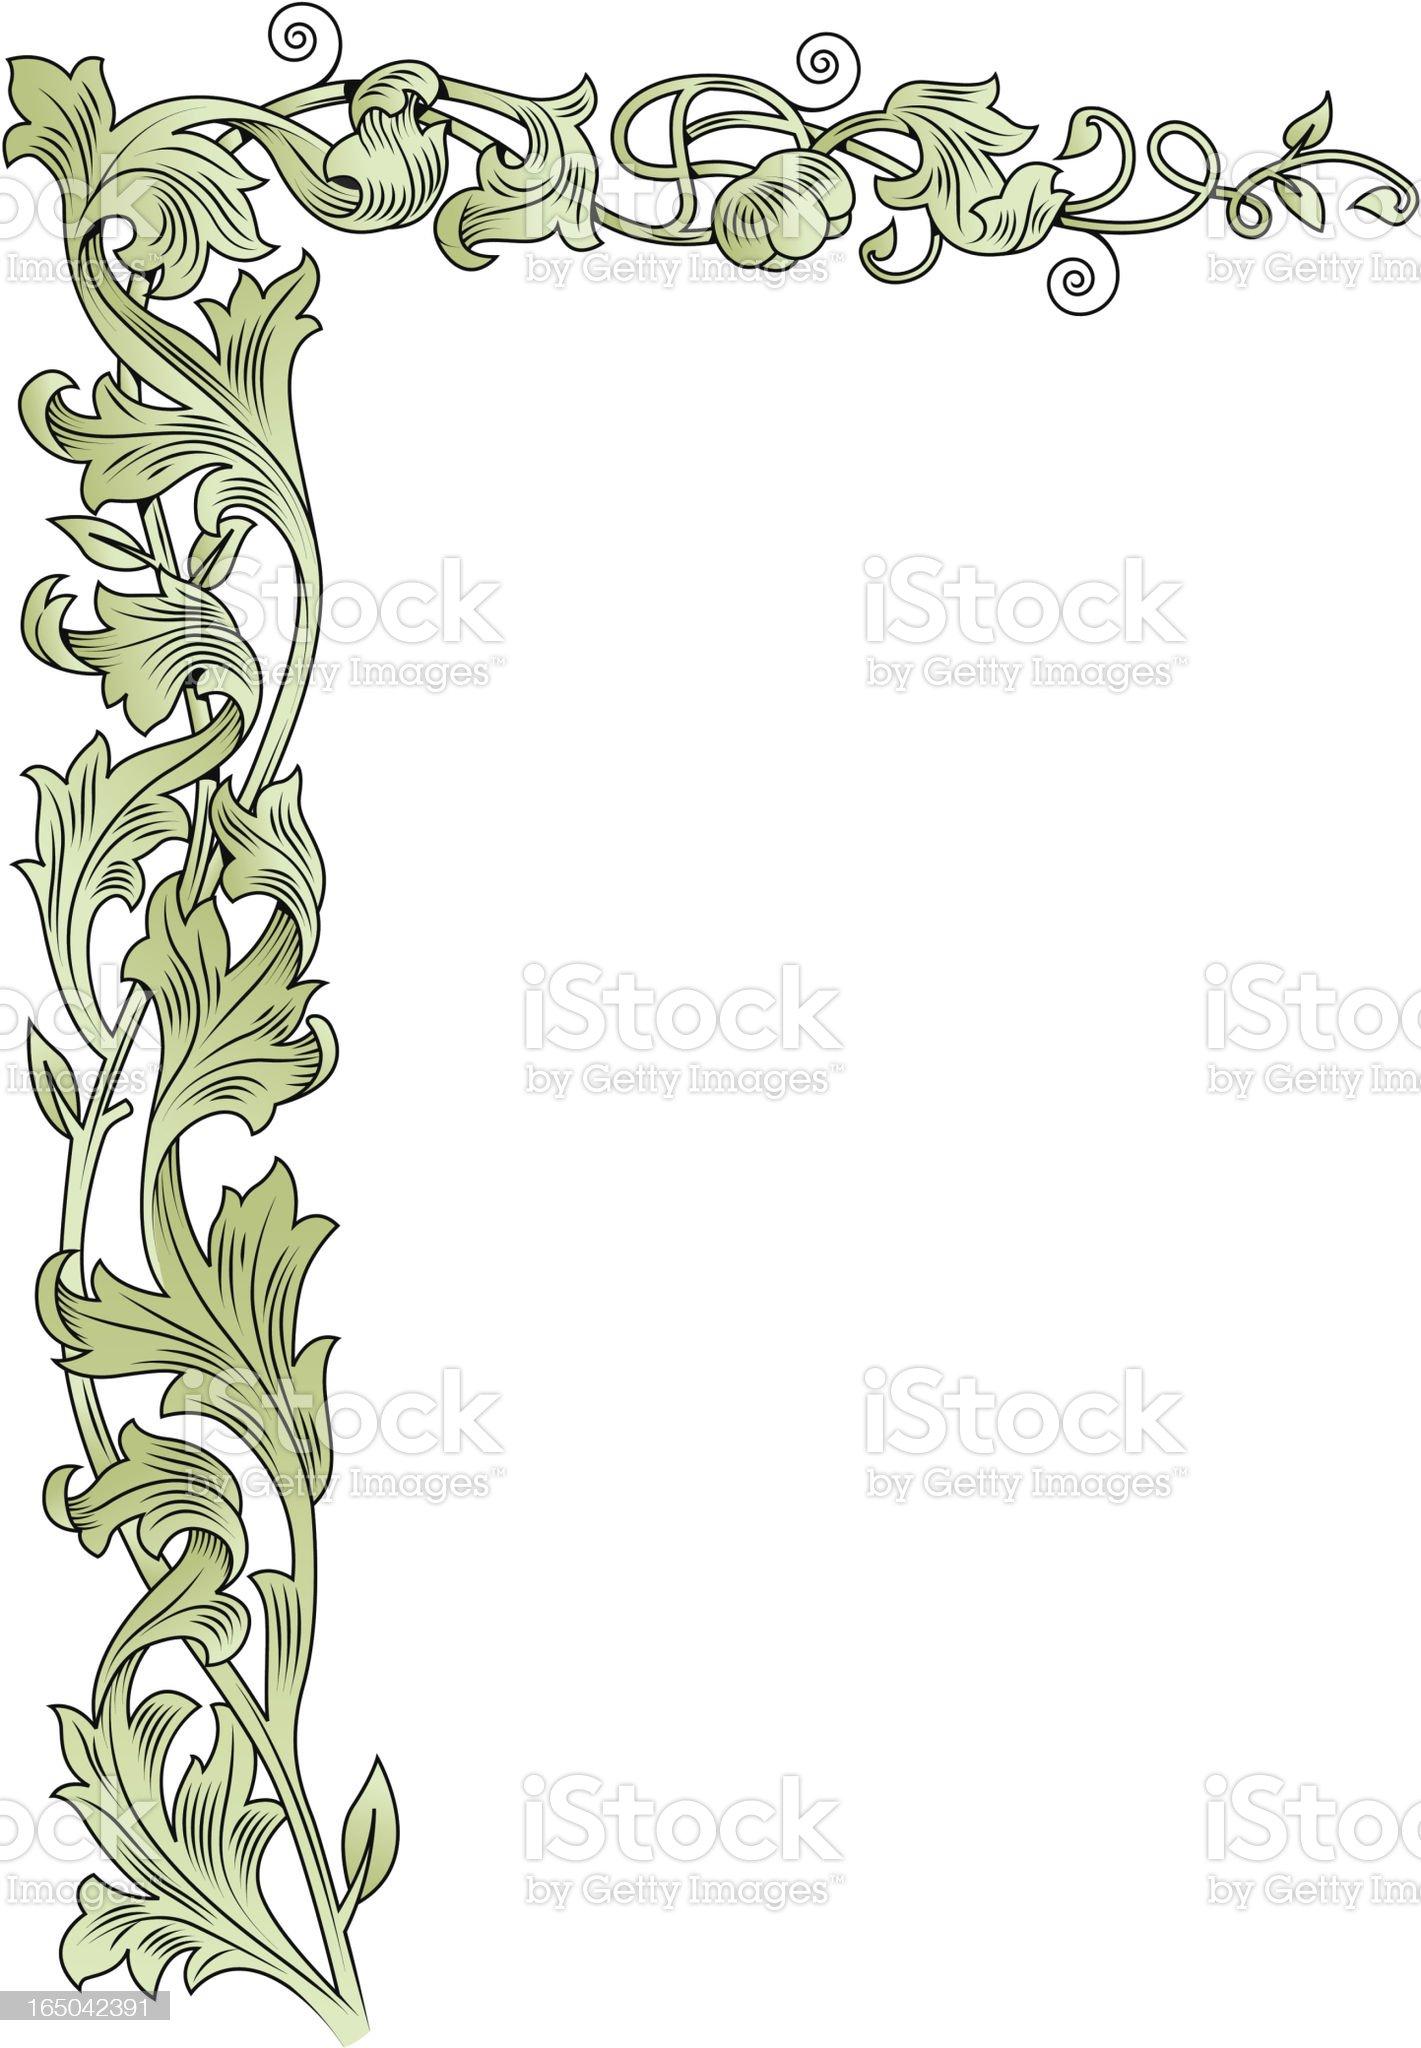 Corner scroll royalty-free stock vector art